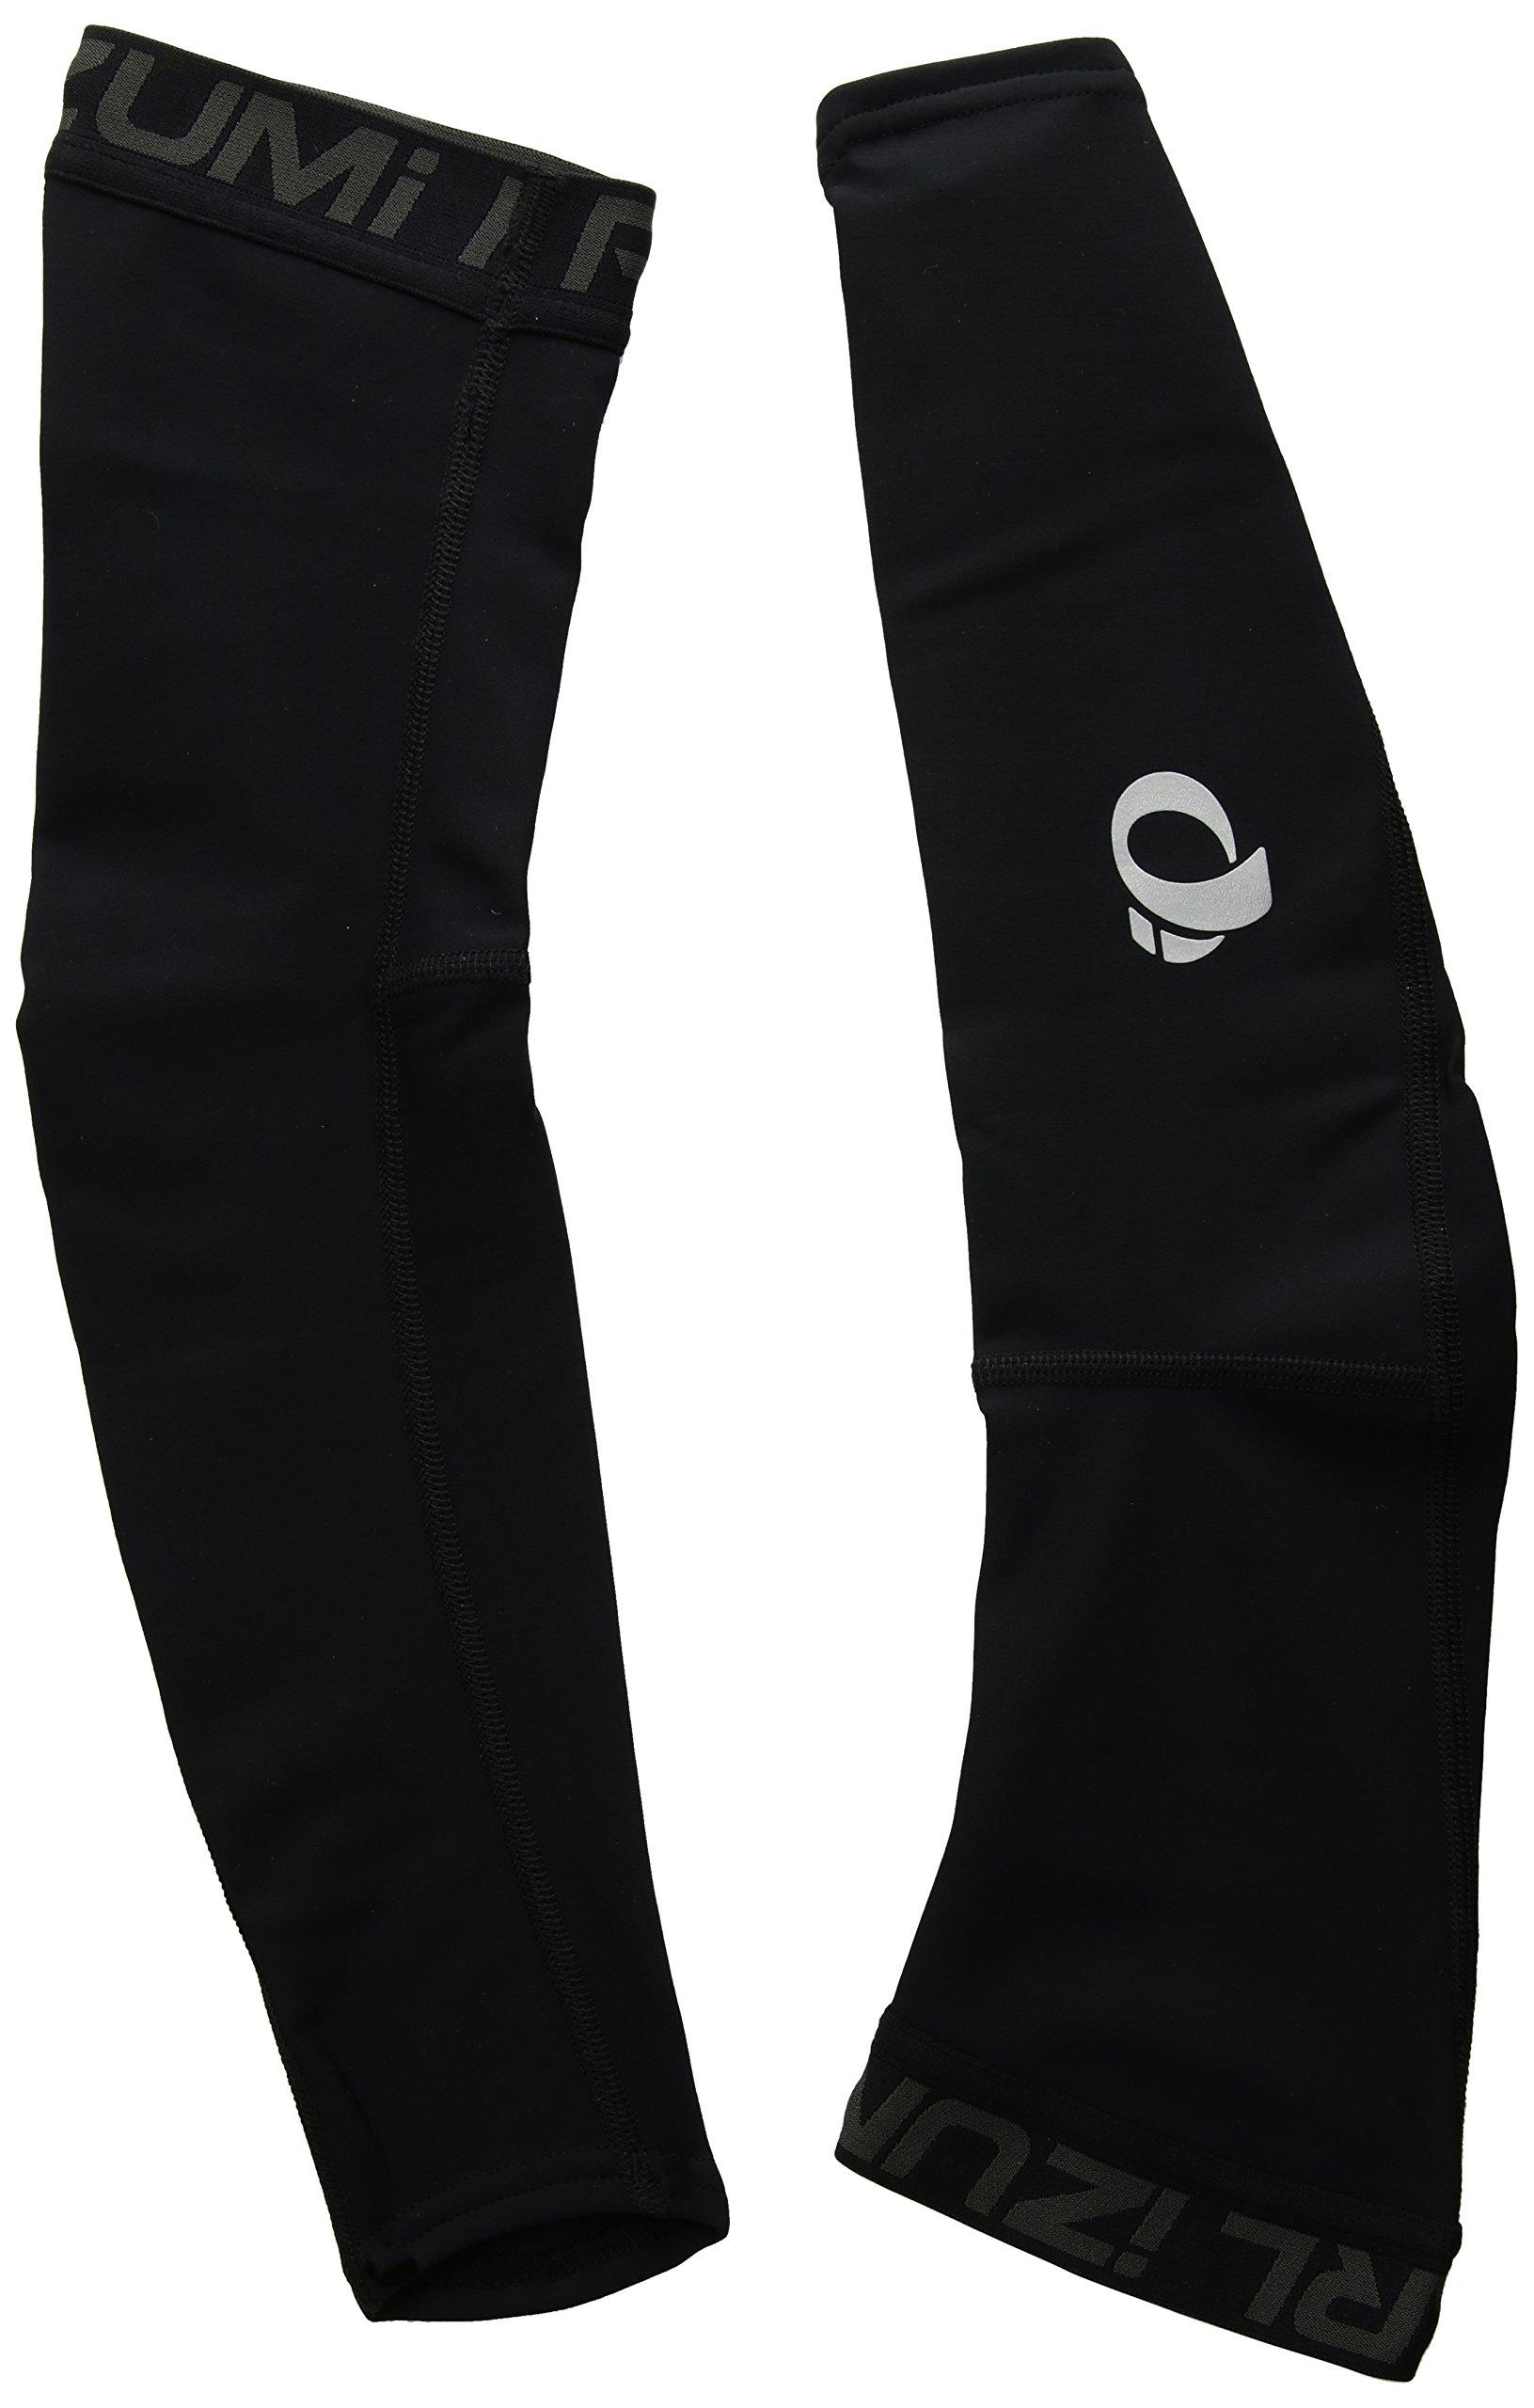 Pearl iZUMi Elite Thermal Arm Warmer, Black, Large by Pearl iZUMi